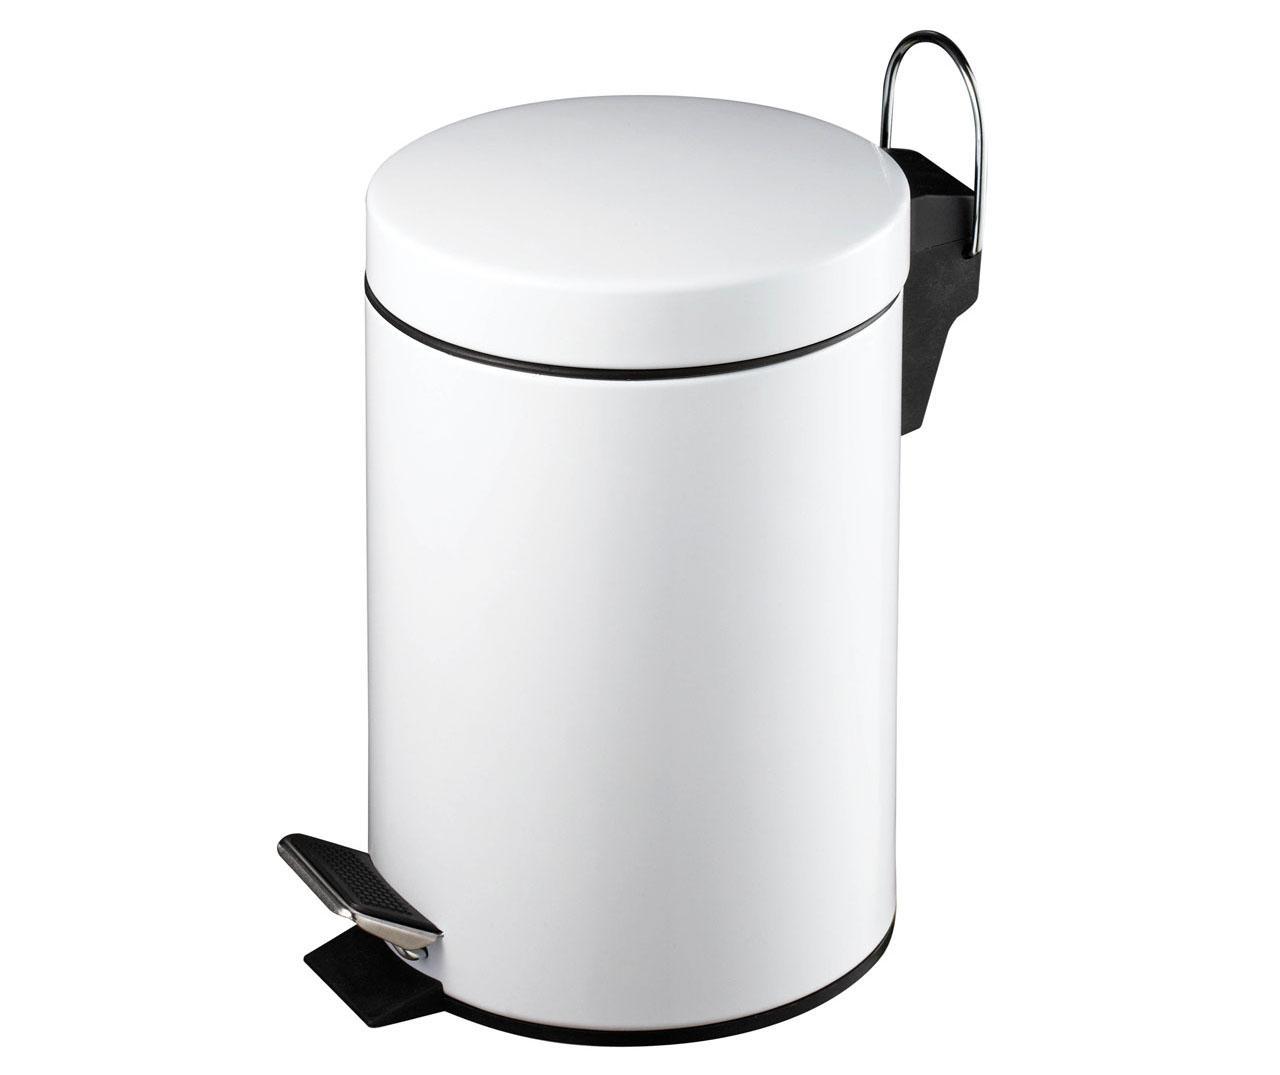 Cos de gunoi cu capac si pedala Simple White 3 L - Premier, Alb imagine